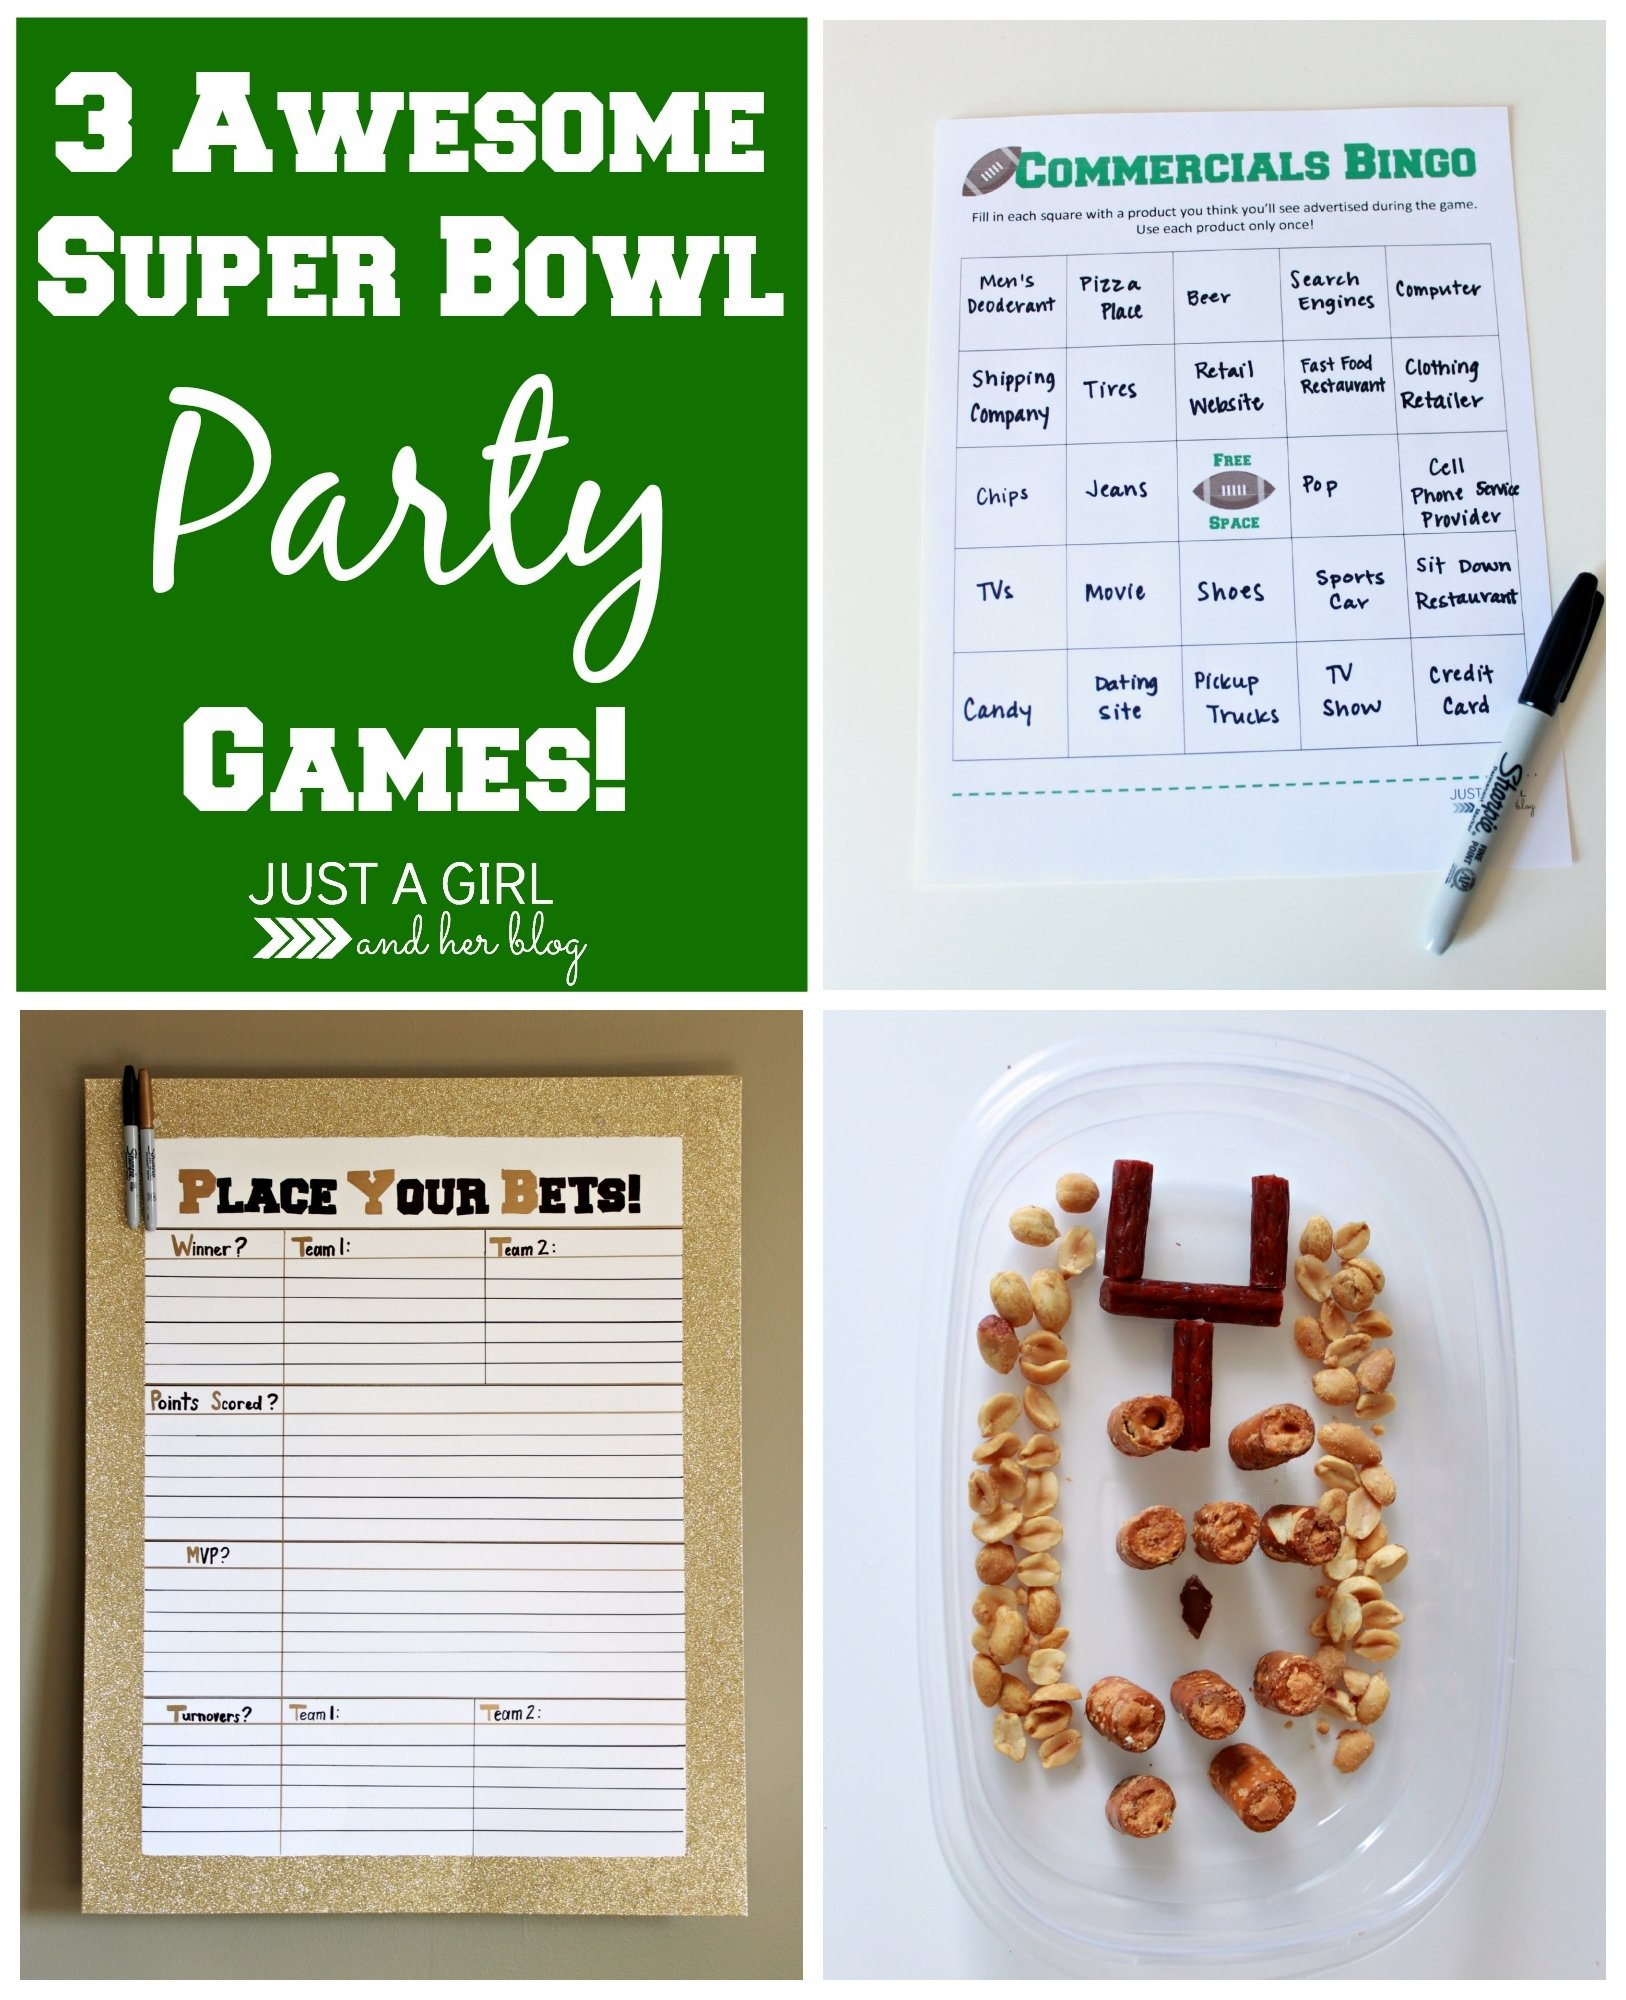 10 Perfect Super Bowl Party Games Ideas super bowl party games ideas wedding 1